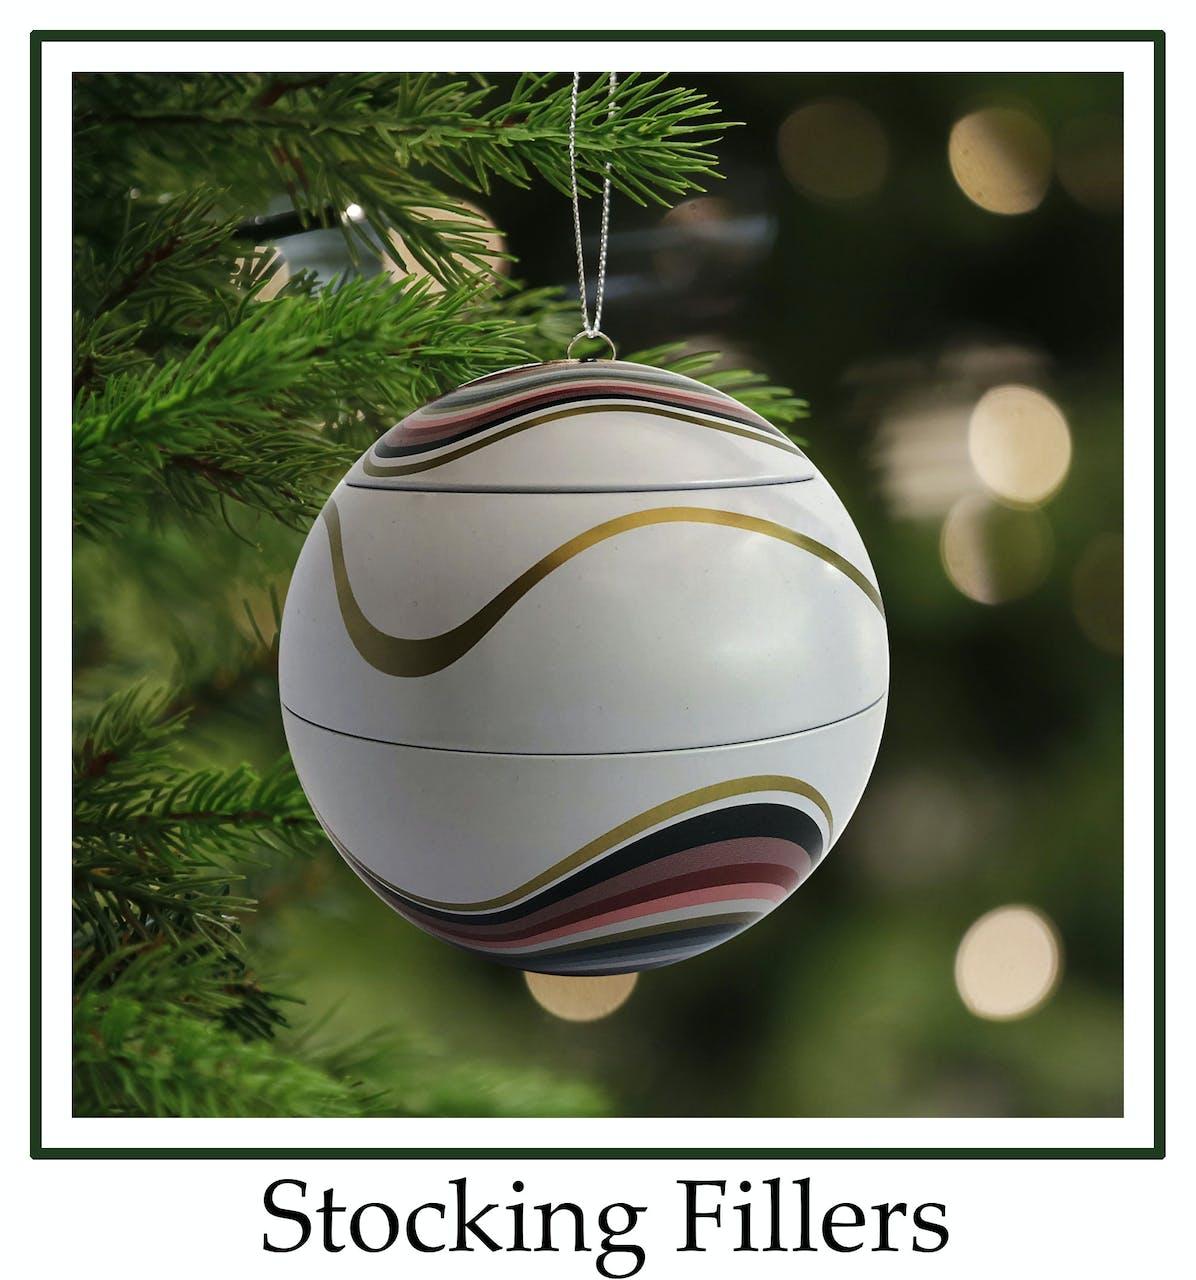 Stocking fillers, gifts under €20, kris kindle gifts, secret santa gifts